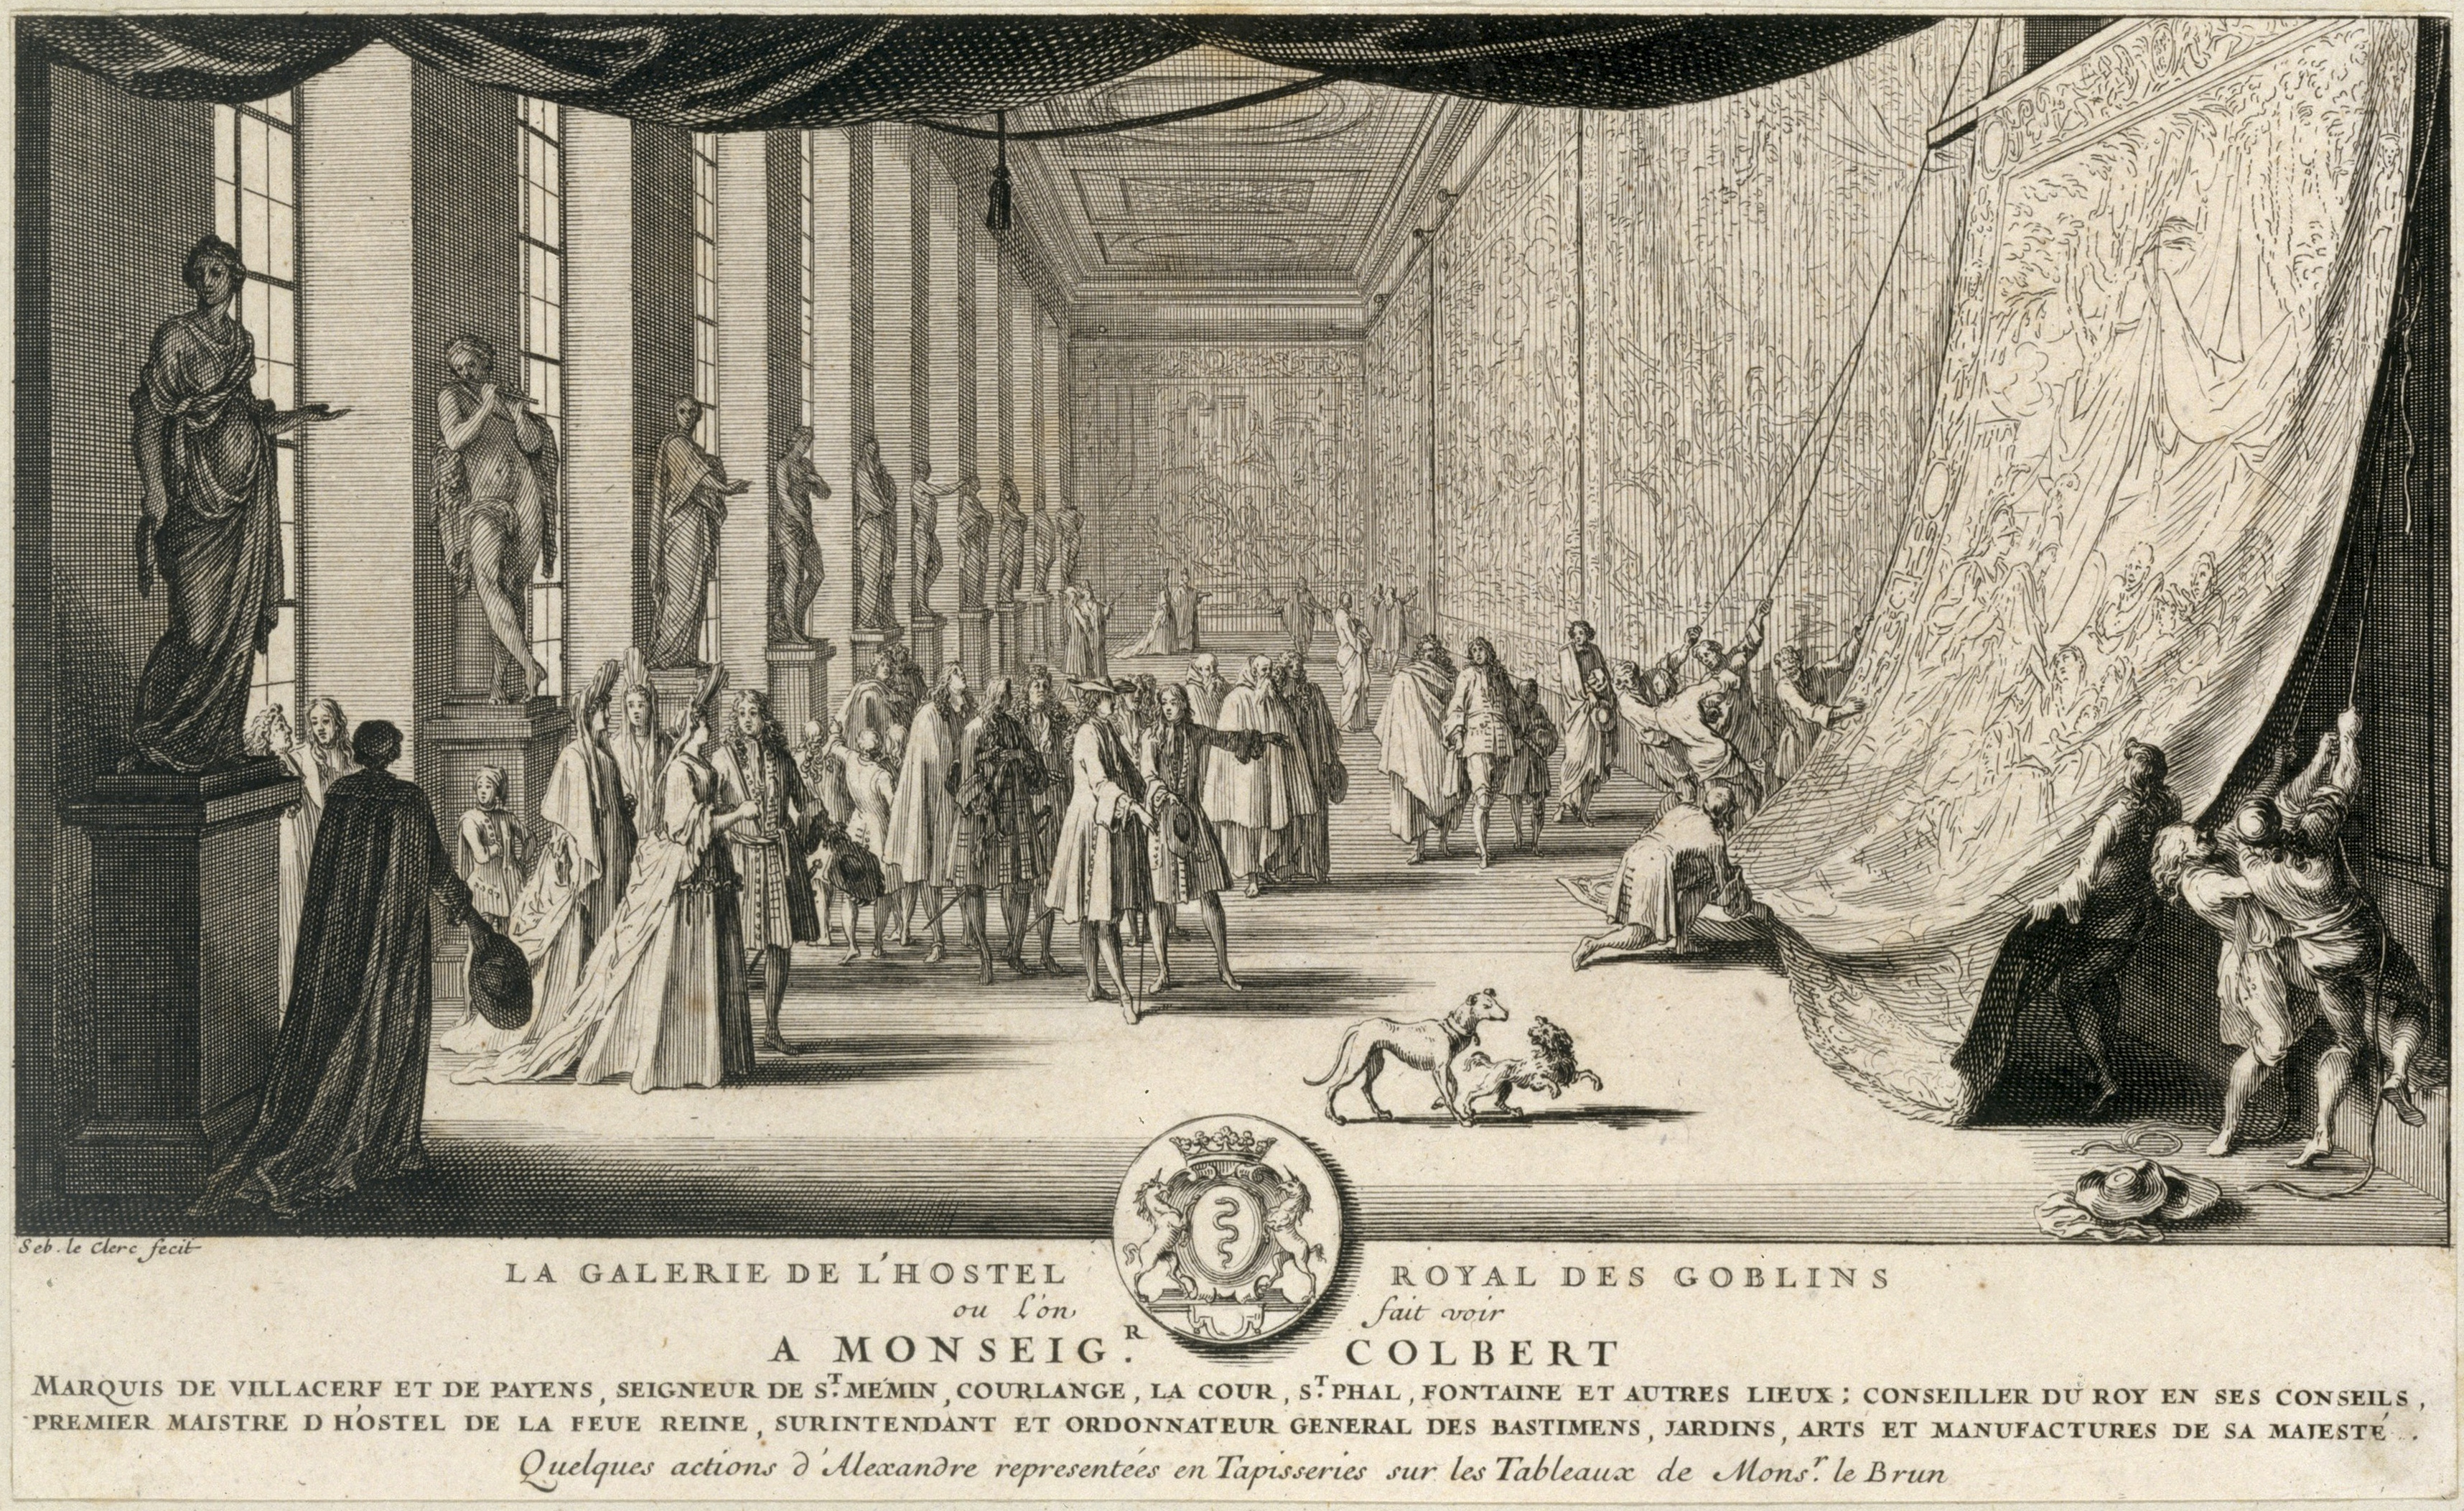 File:Sébastien Leclerc I, Colbert Visiting the Gobelins, ca. 1665.jpg